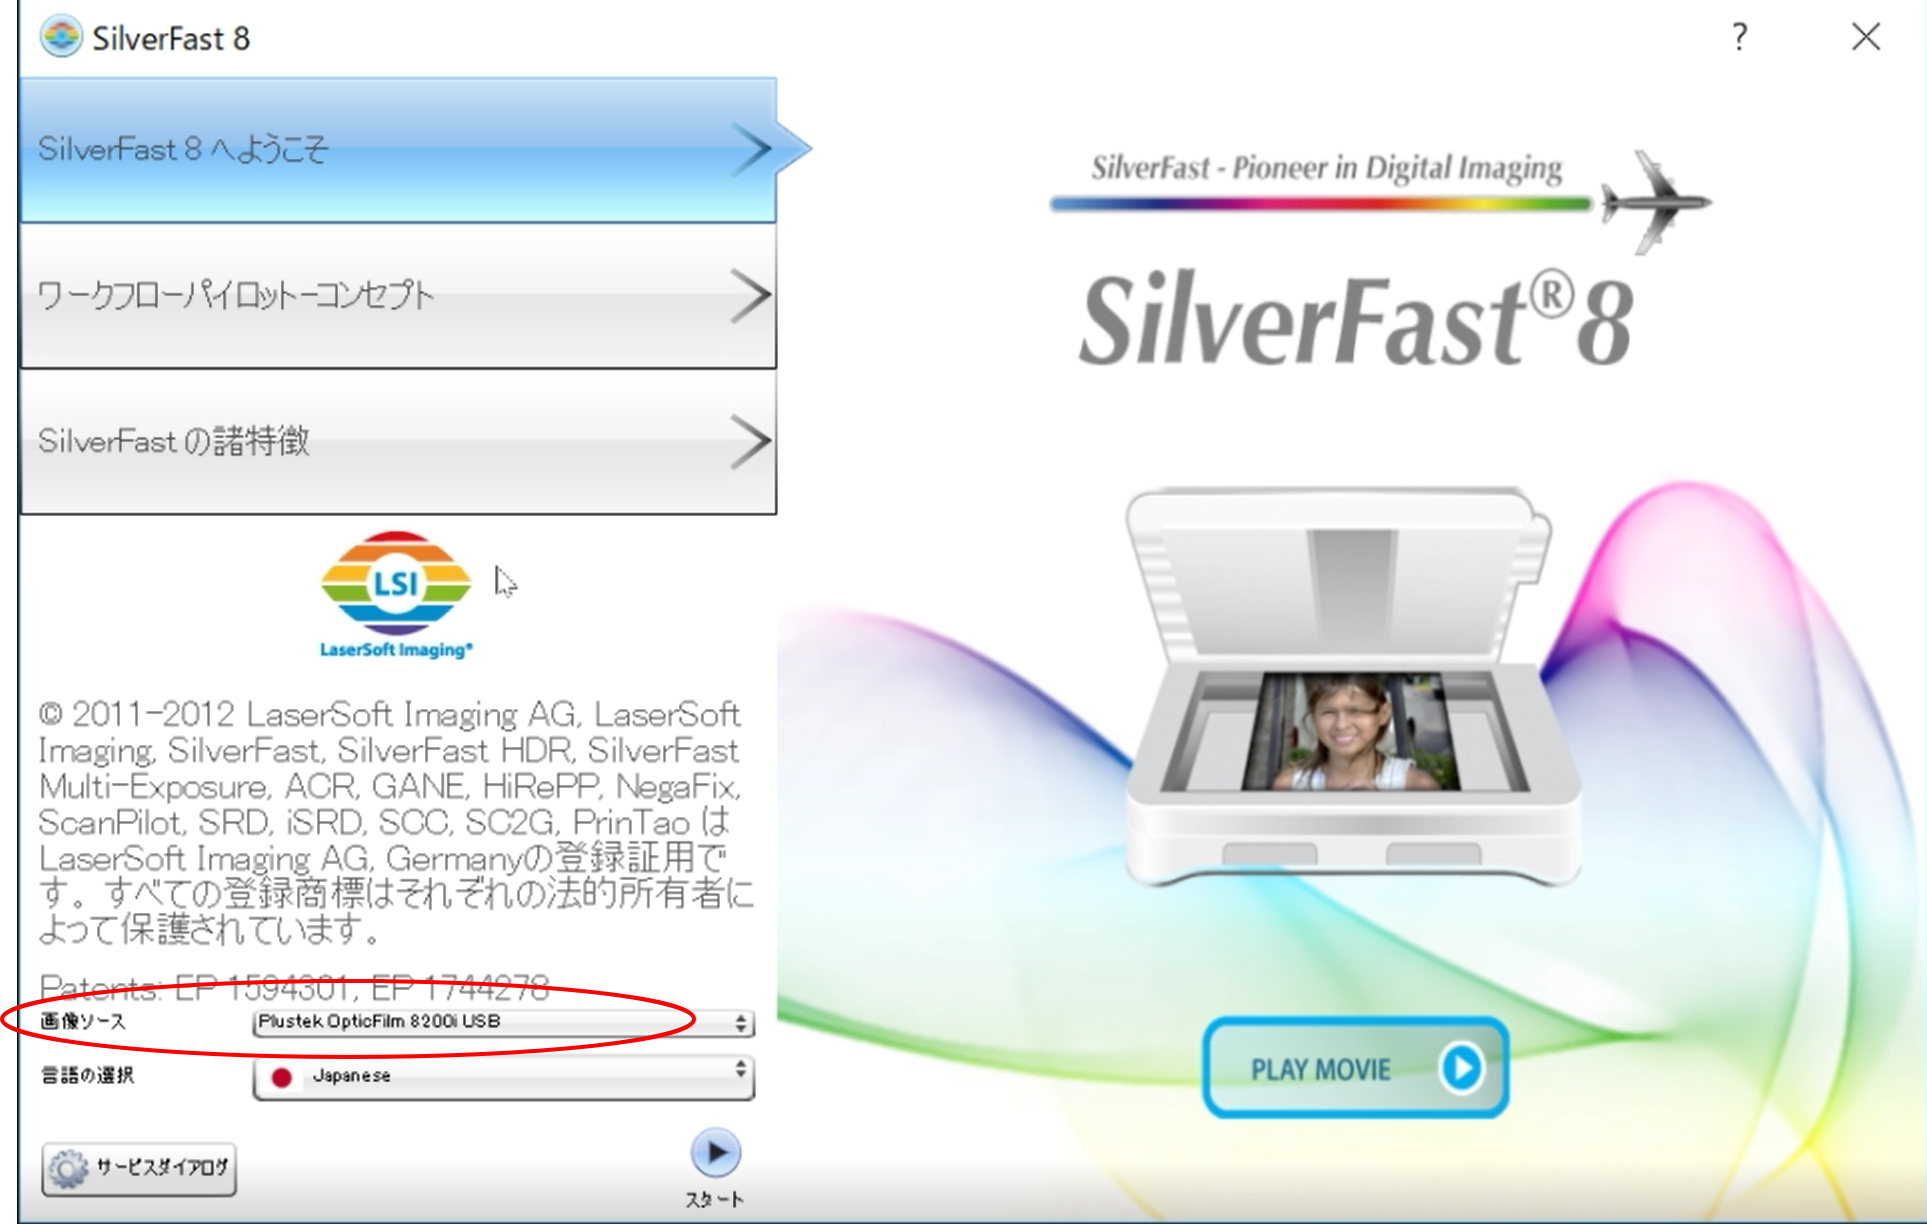 SilverFast 起動画面<br>window中、「画像ソース」の項目を注目。